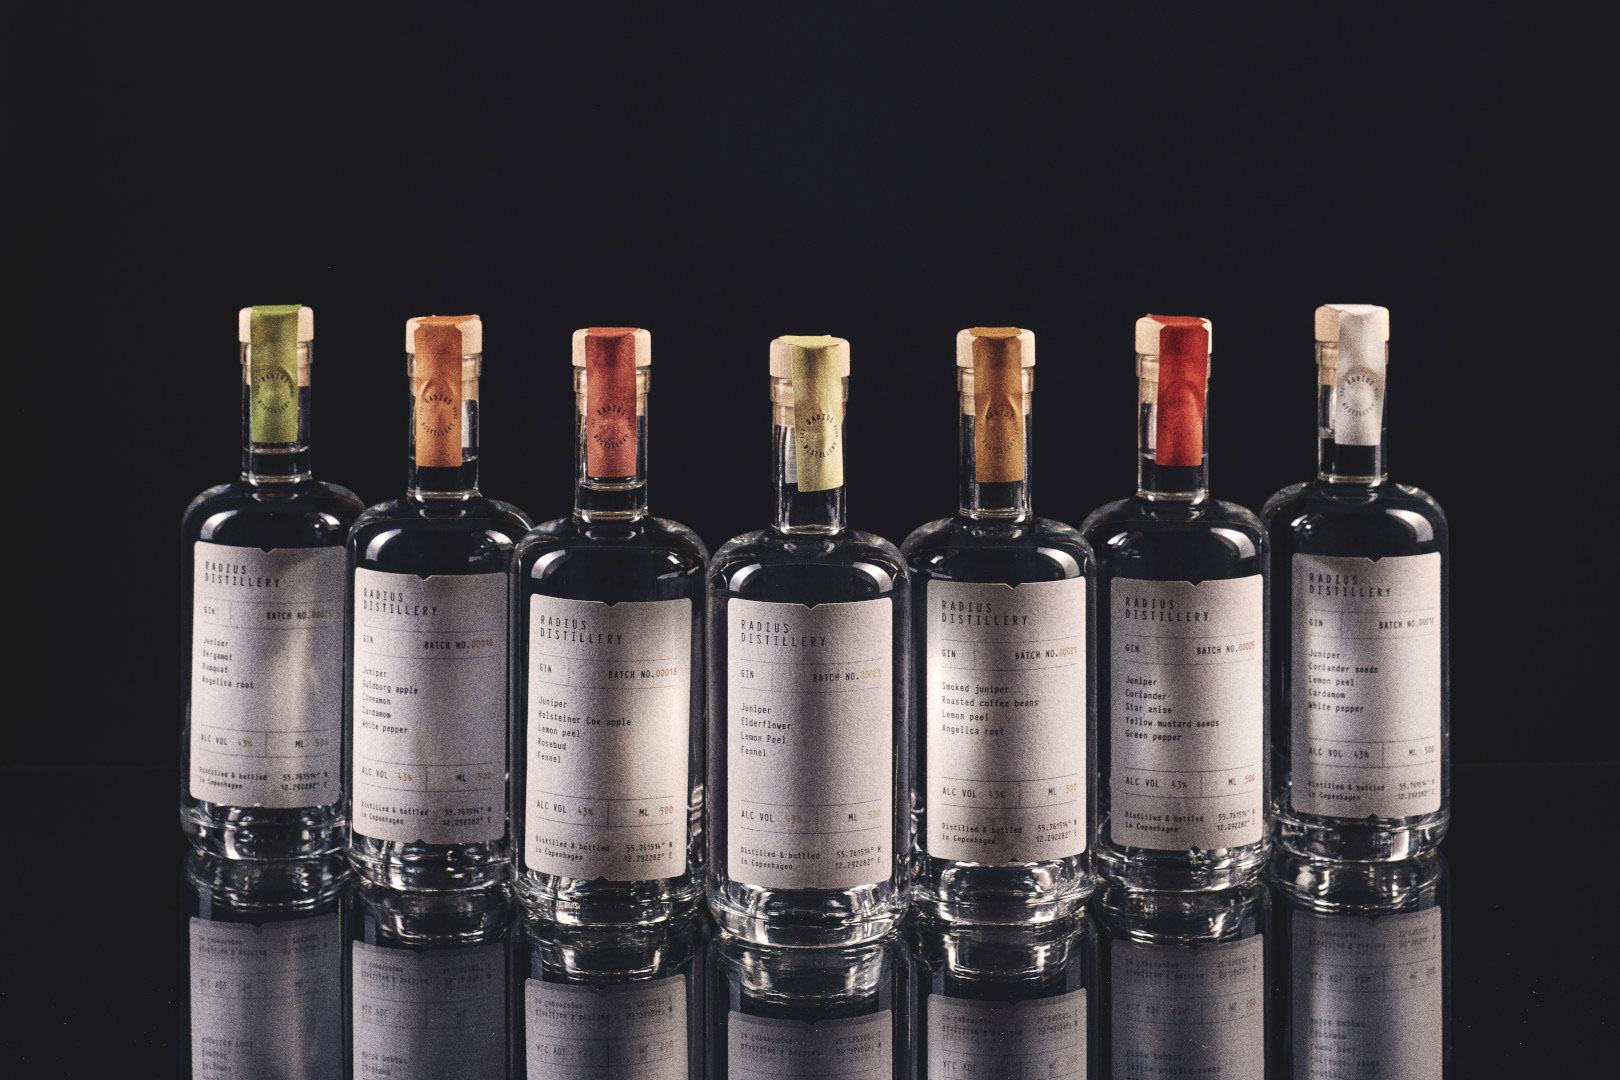 2_Radius Distillery_5_Gins_Radius Distillery